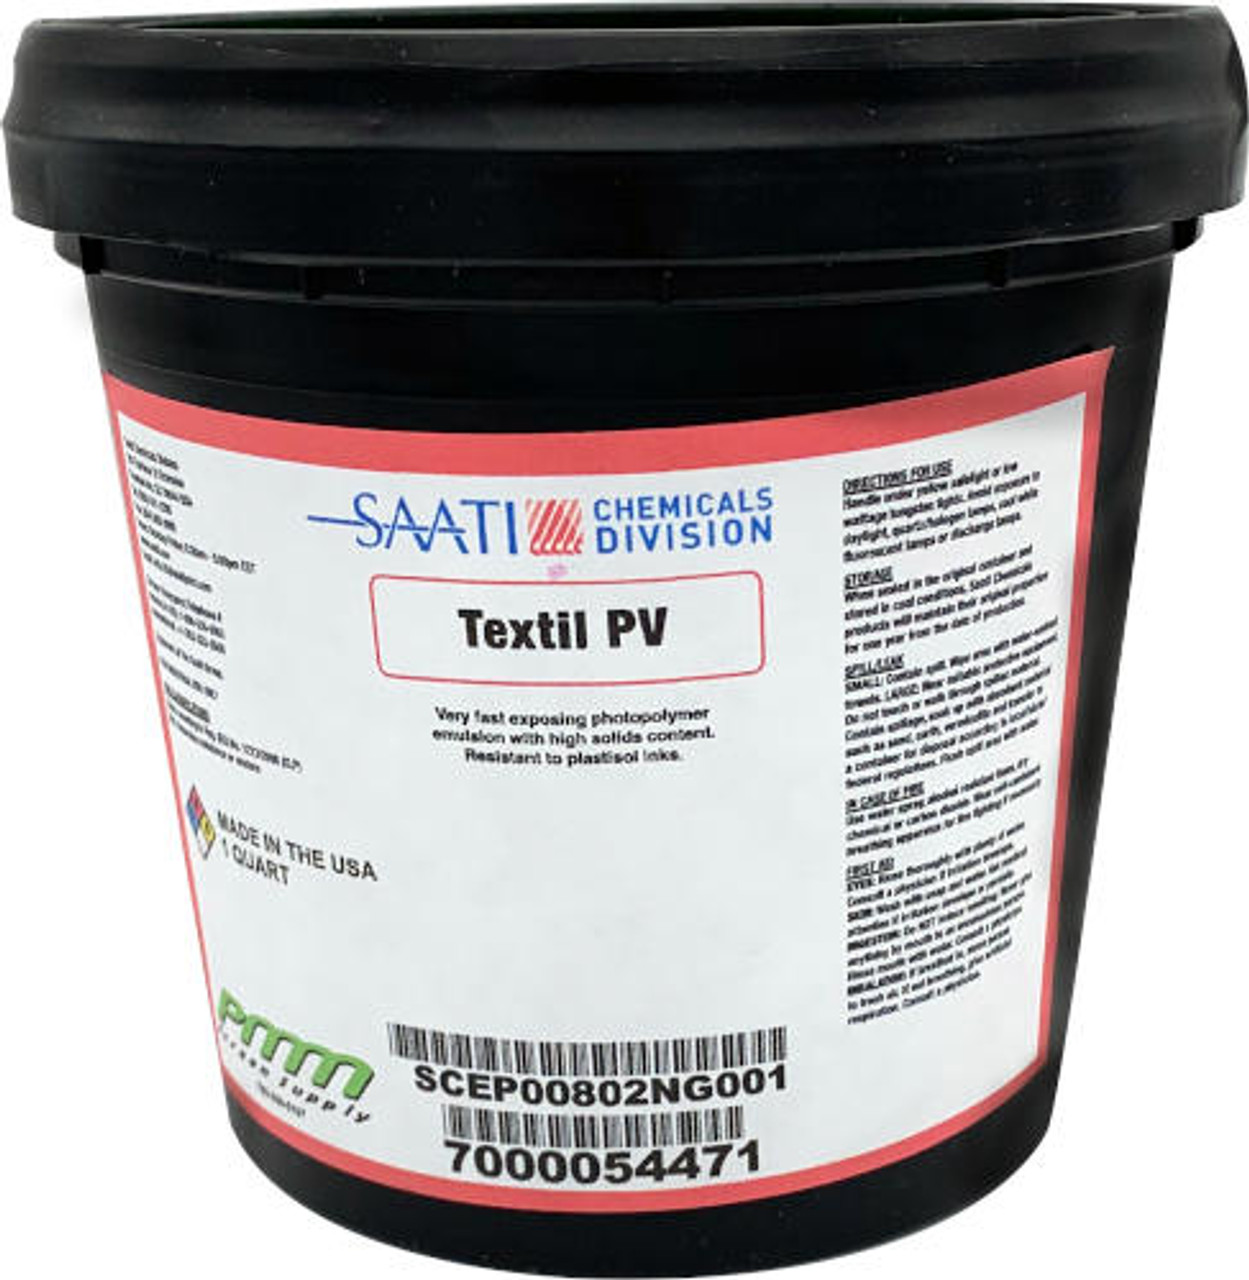 Saati Textil PV emulsion